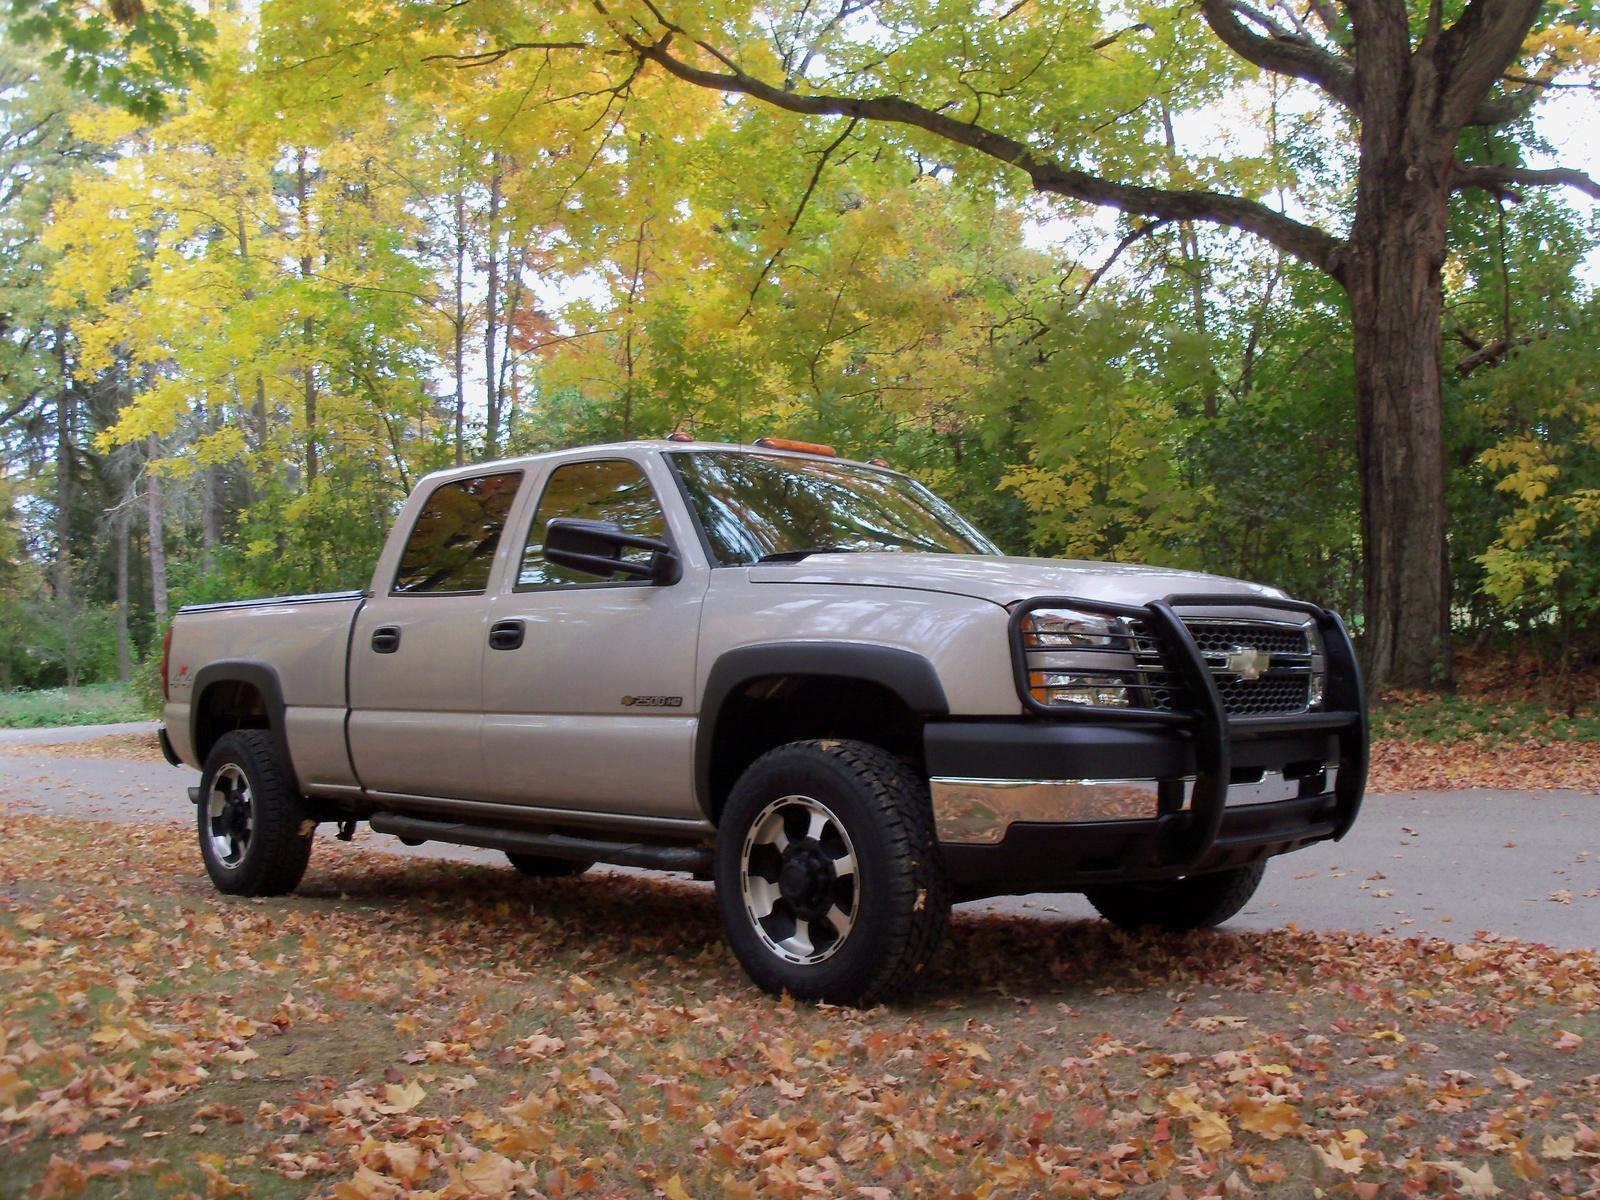 2012 chevrolet 2500hd towing capacity autos post. Black Bedroom Furniture Sets. Home Design Ideas